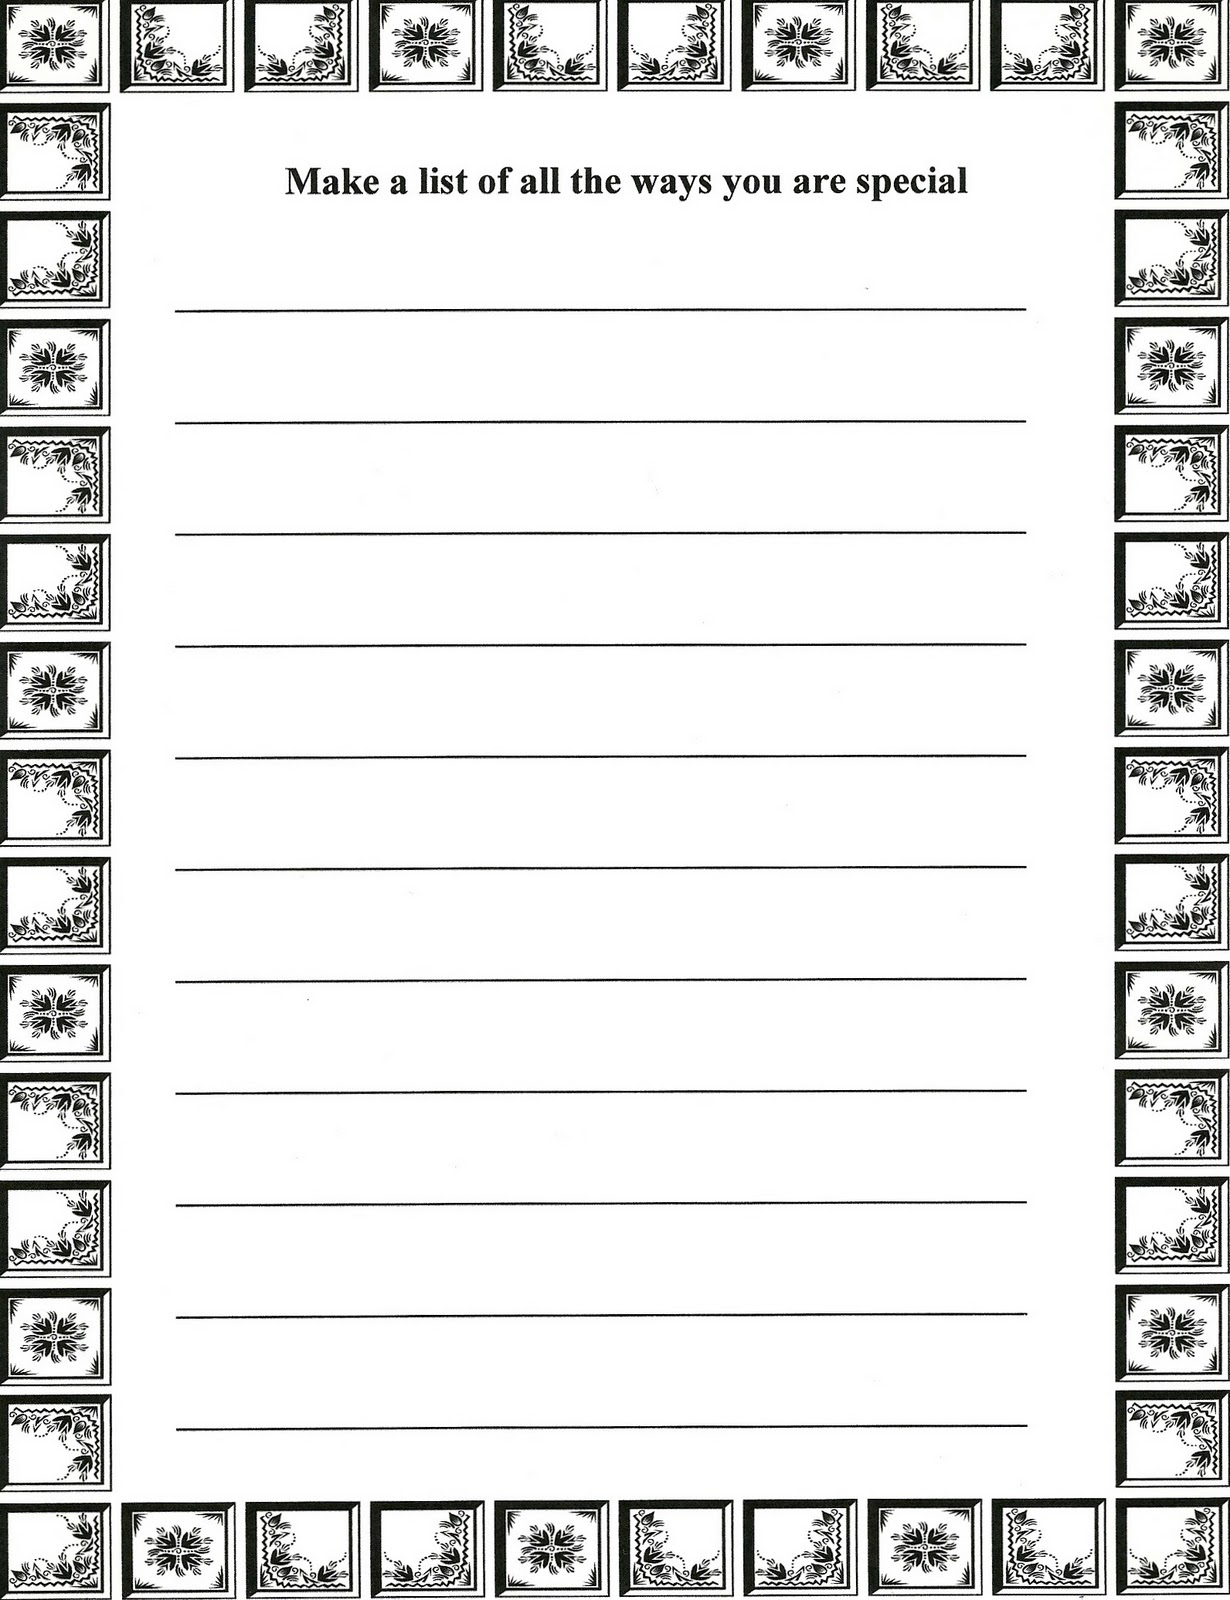 Anti Bullying Worksheets For Preschoolers